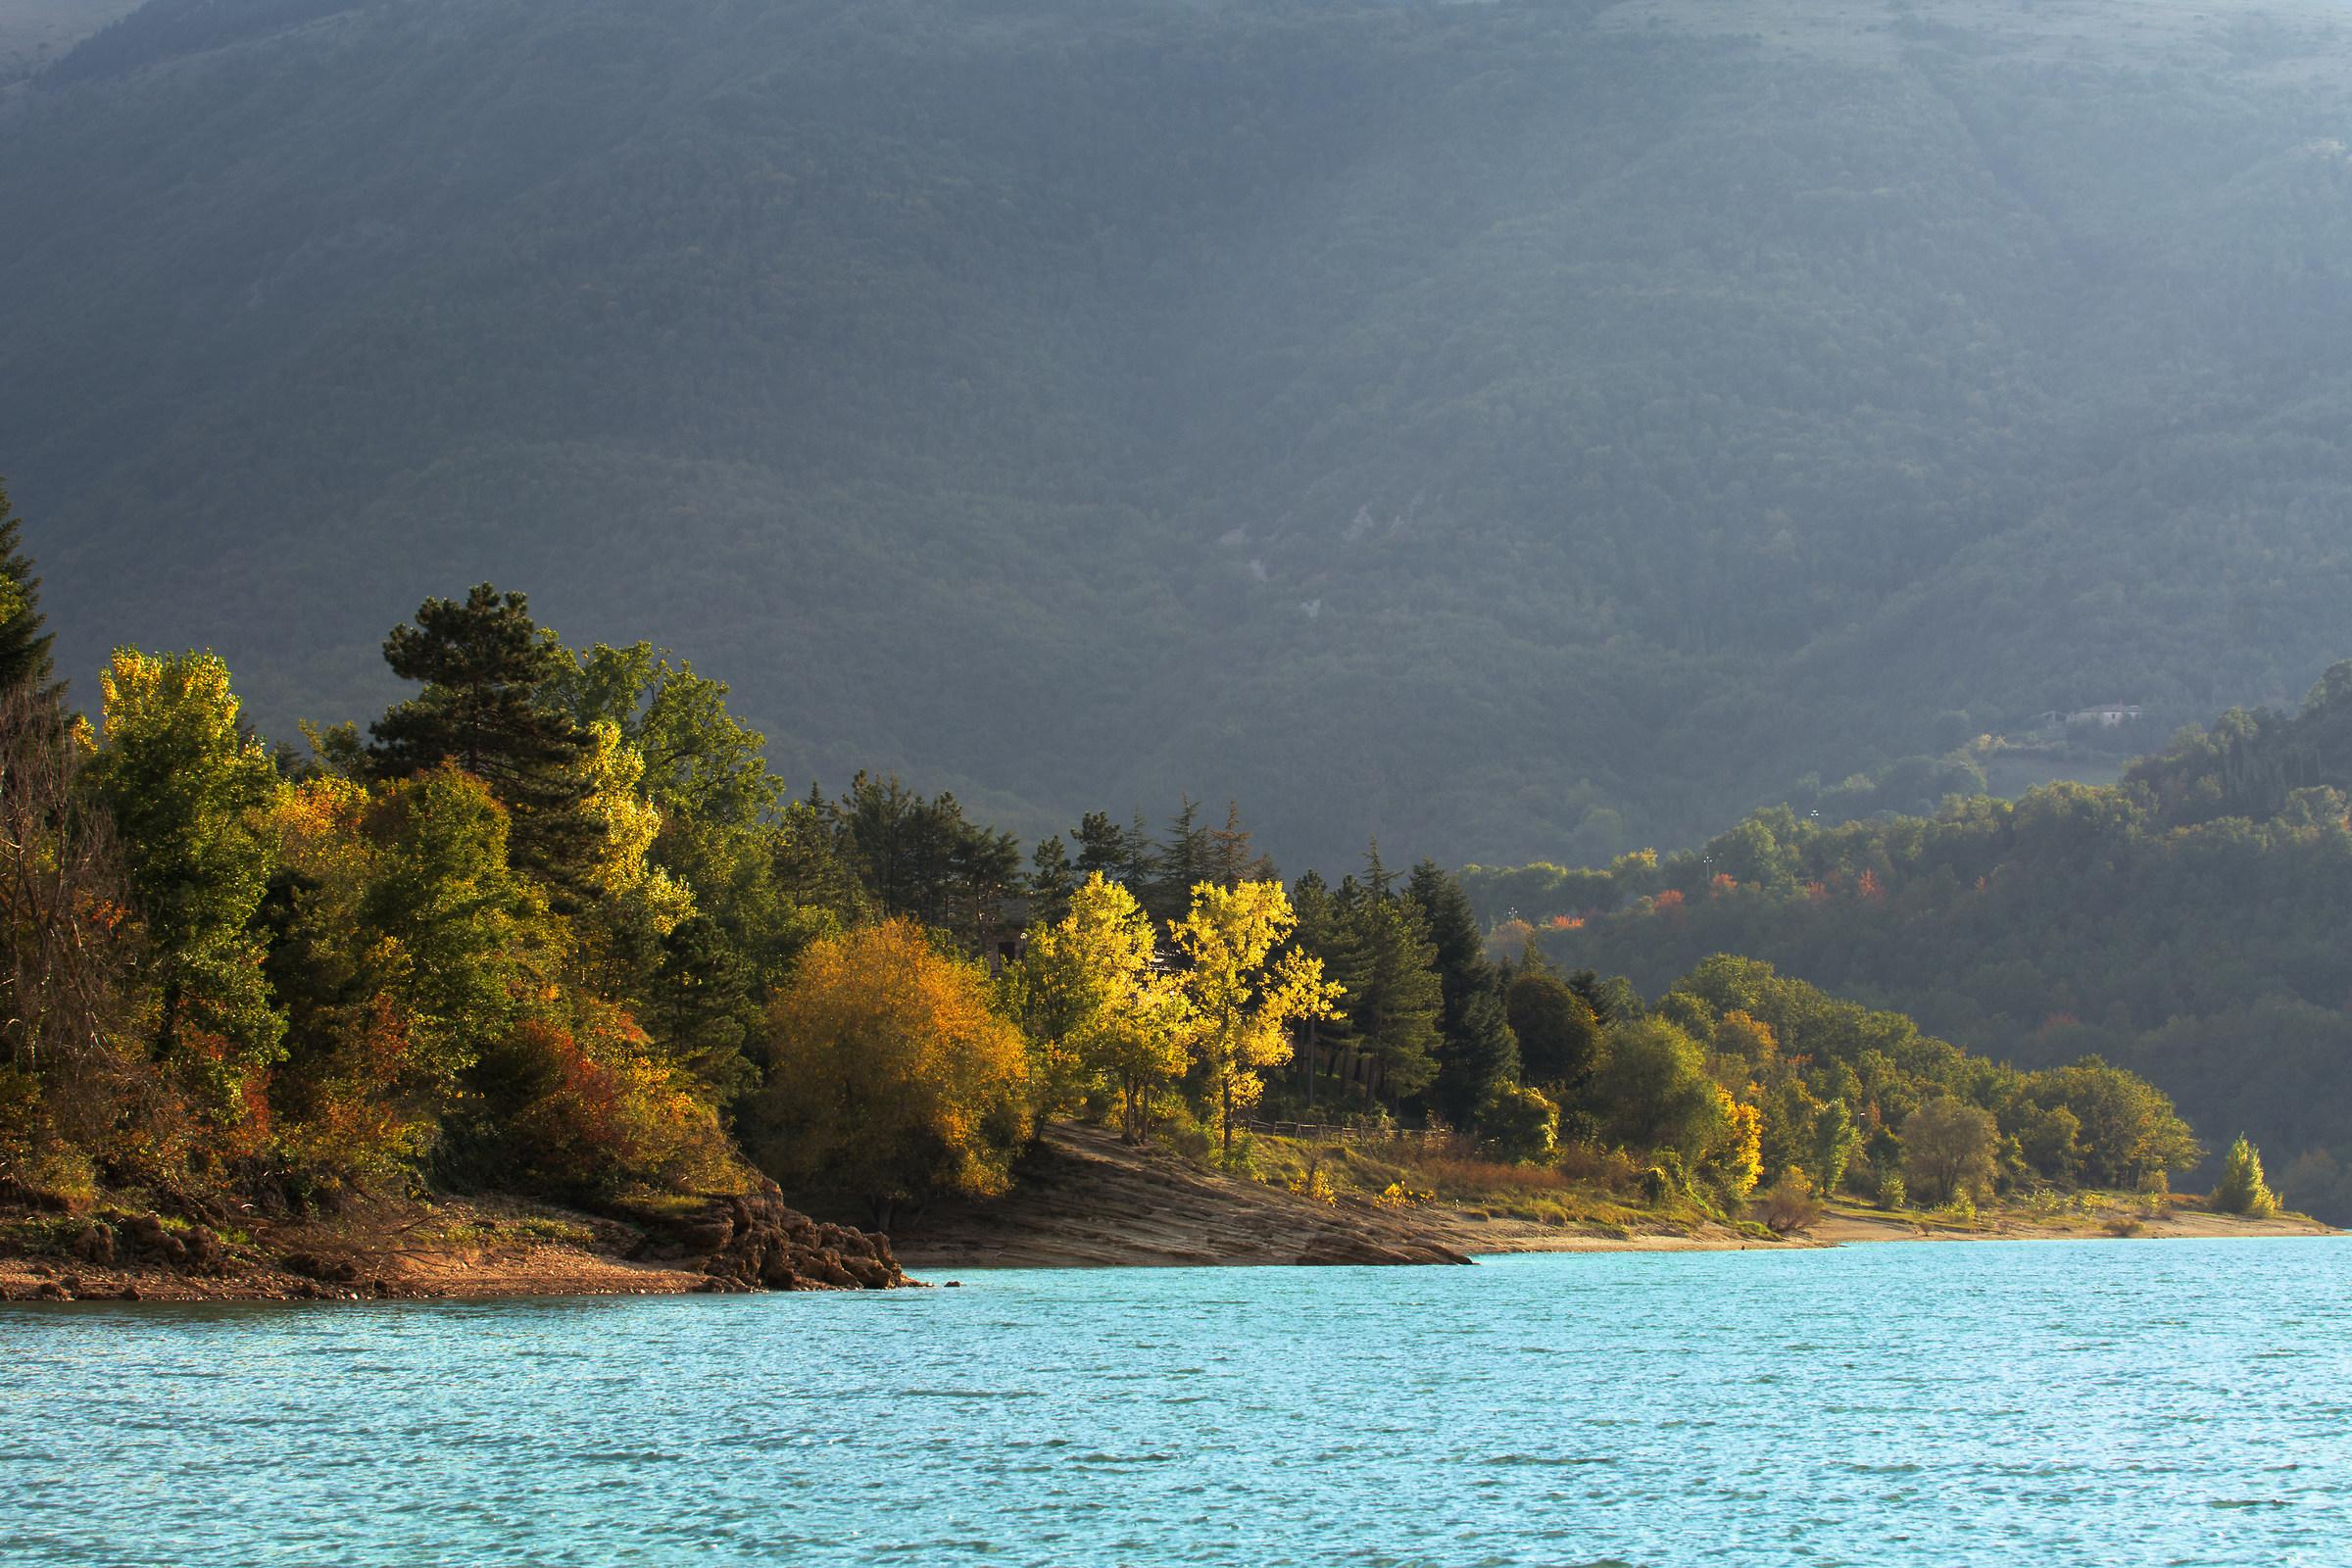 The magic of the lake...